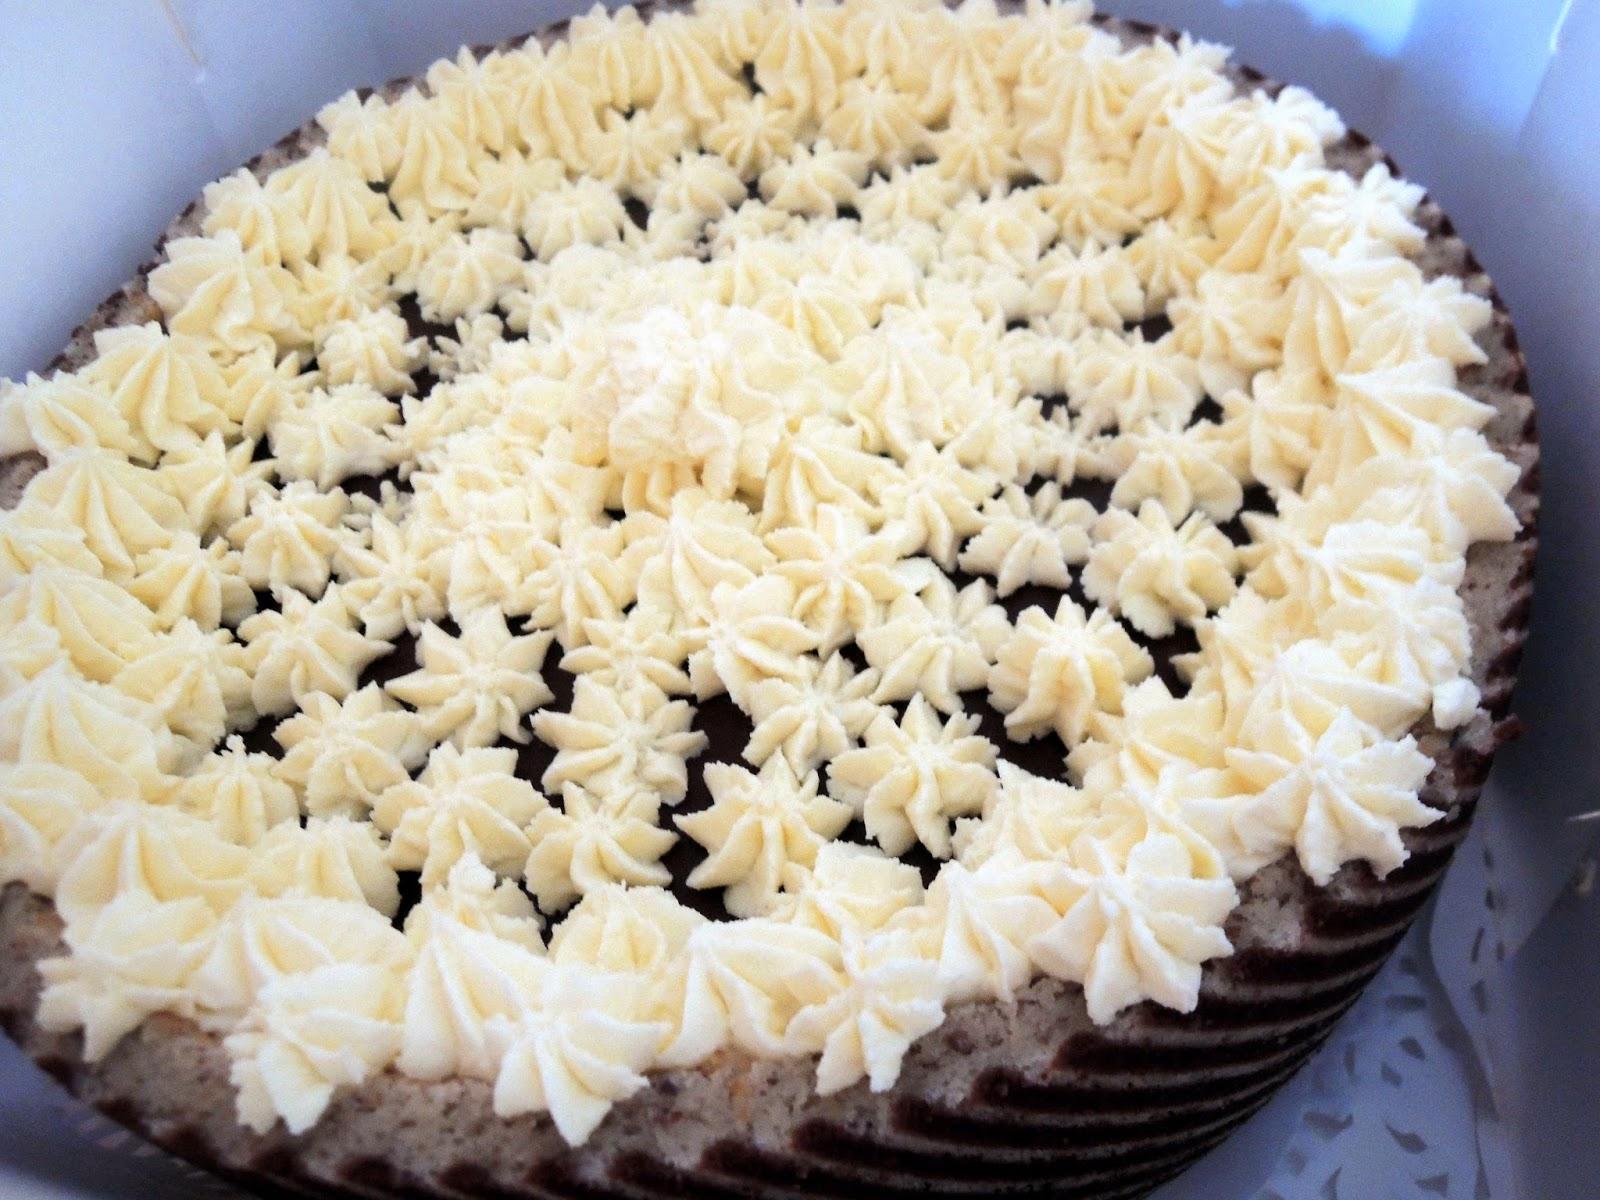 Around the World - in favorite recipes: Joconde Cake with Hazelnuts